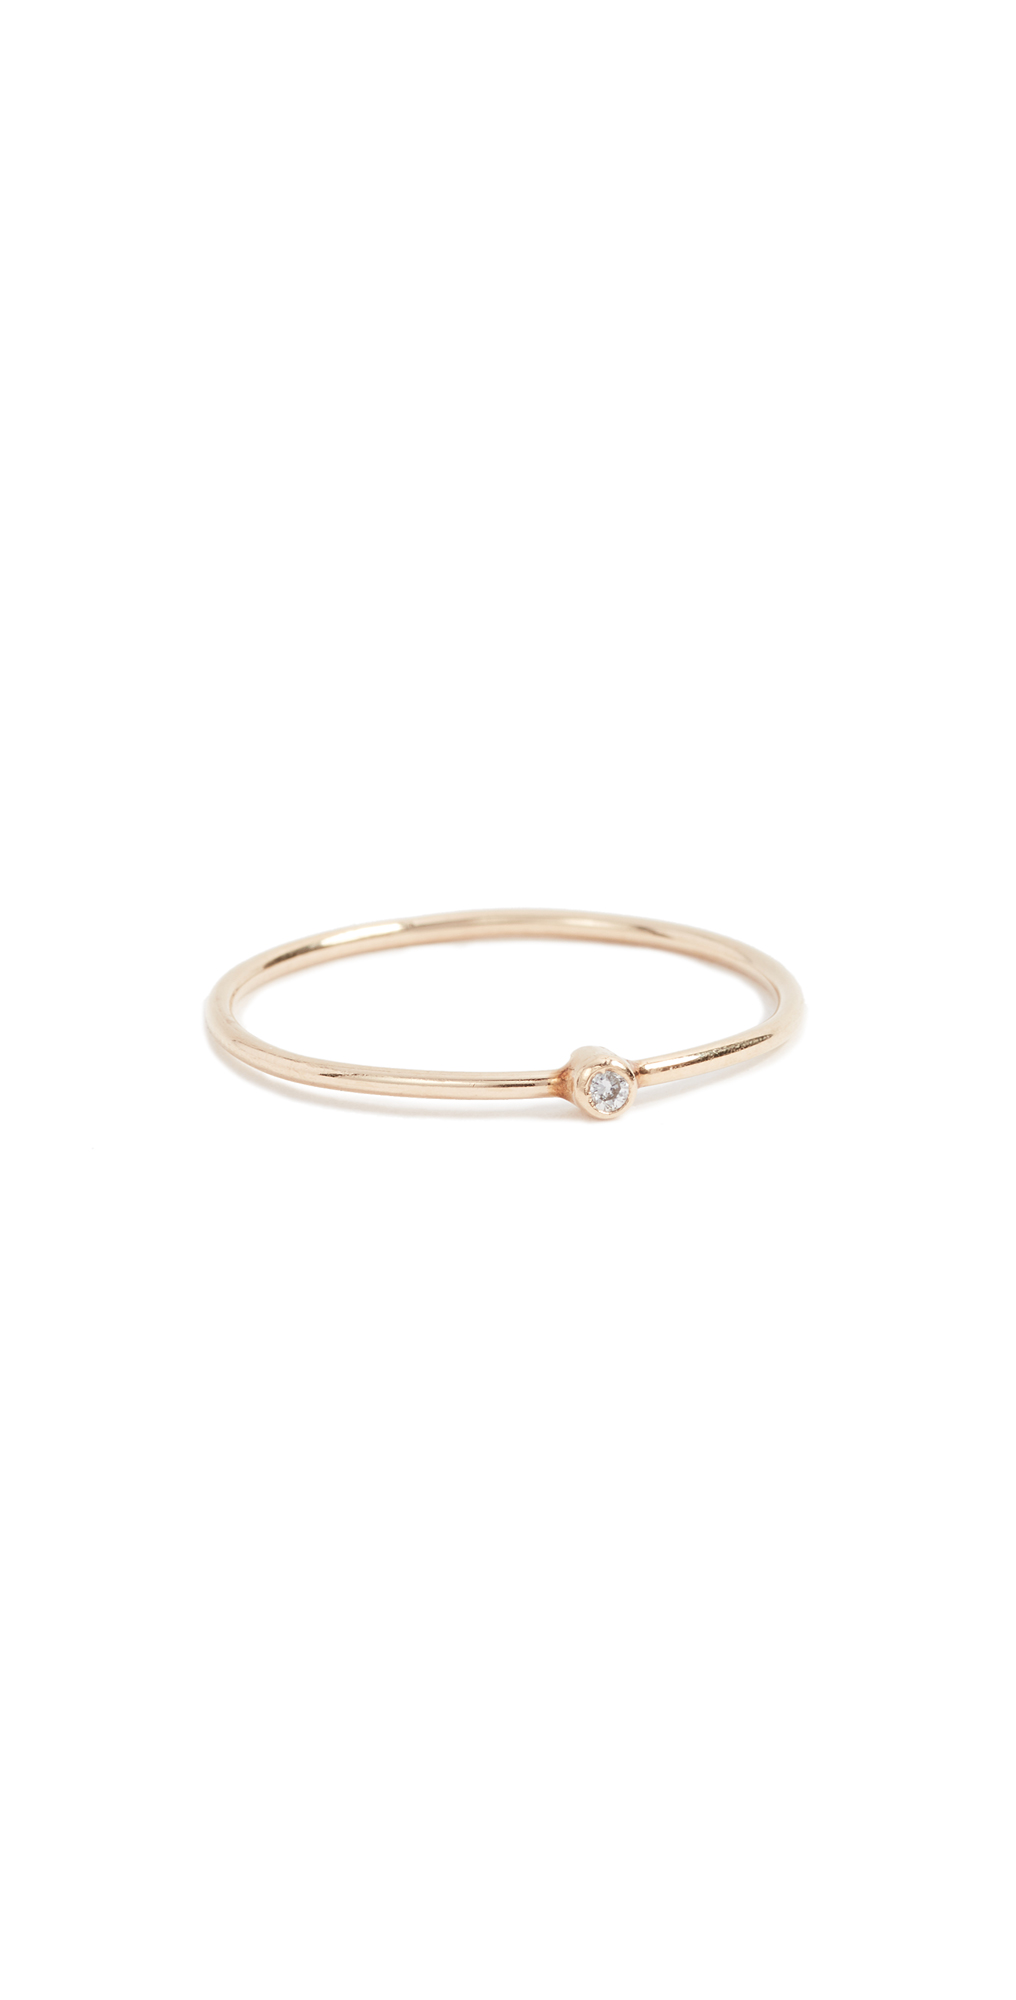 18k Gold Thin Diamond Ring